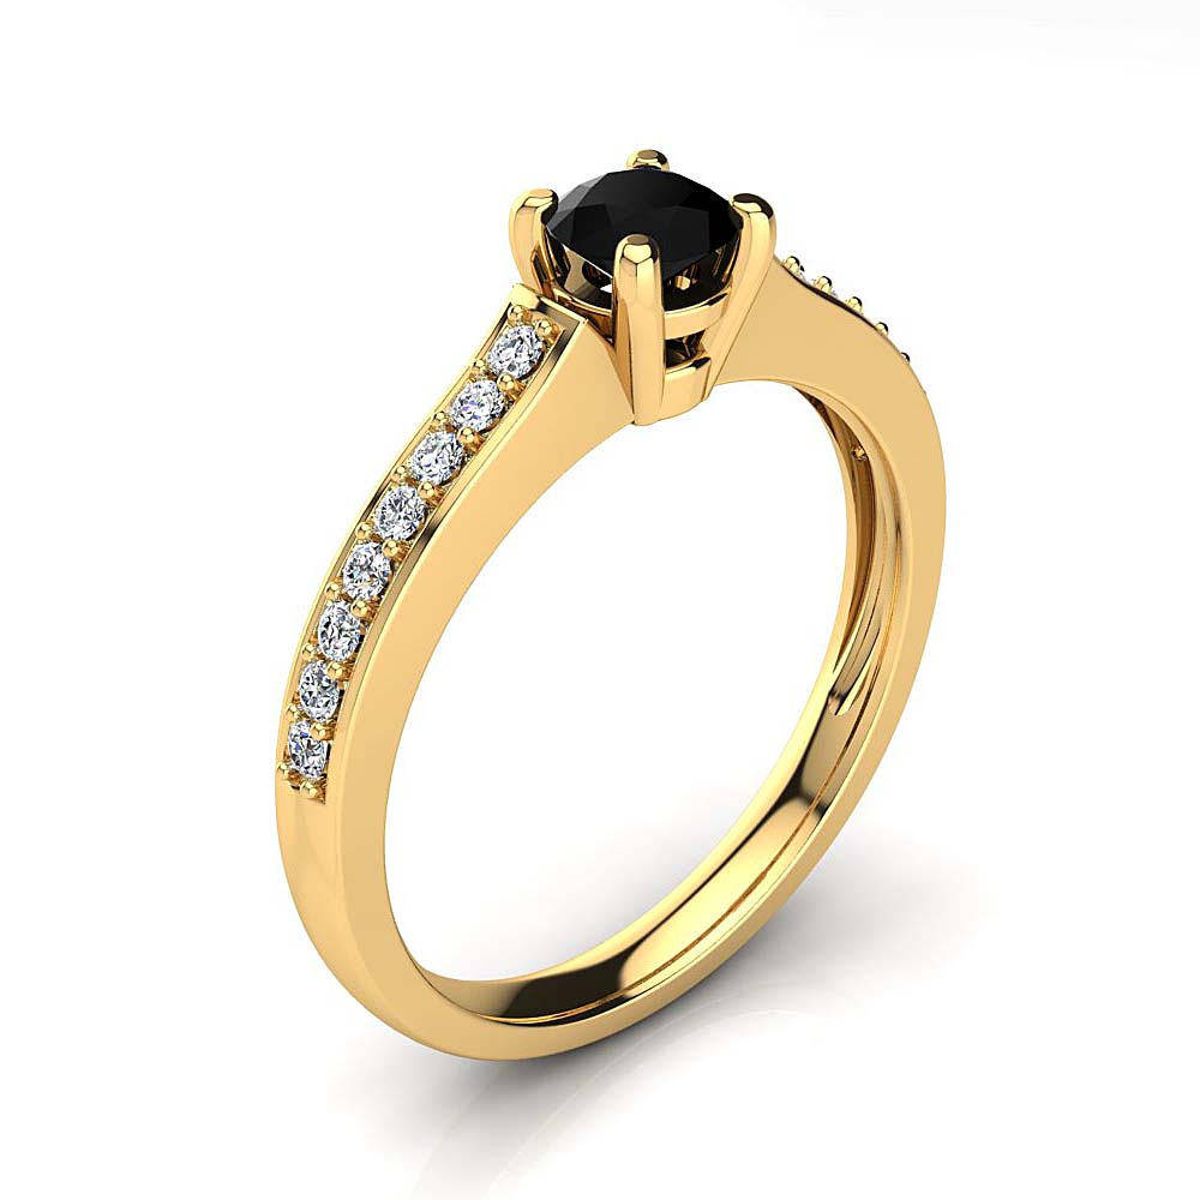 Affordable Half Carat White & Black Diamond Engagement Ring in 14k Gold